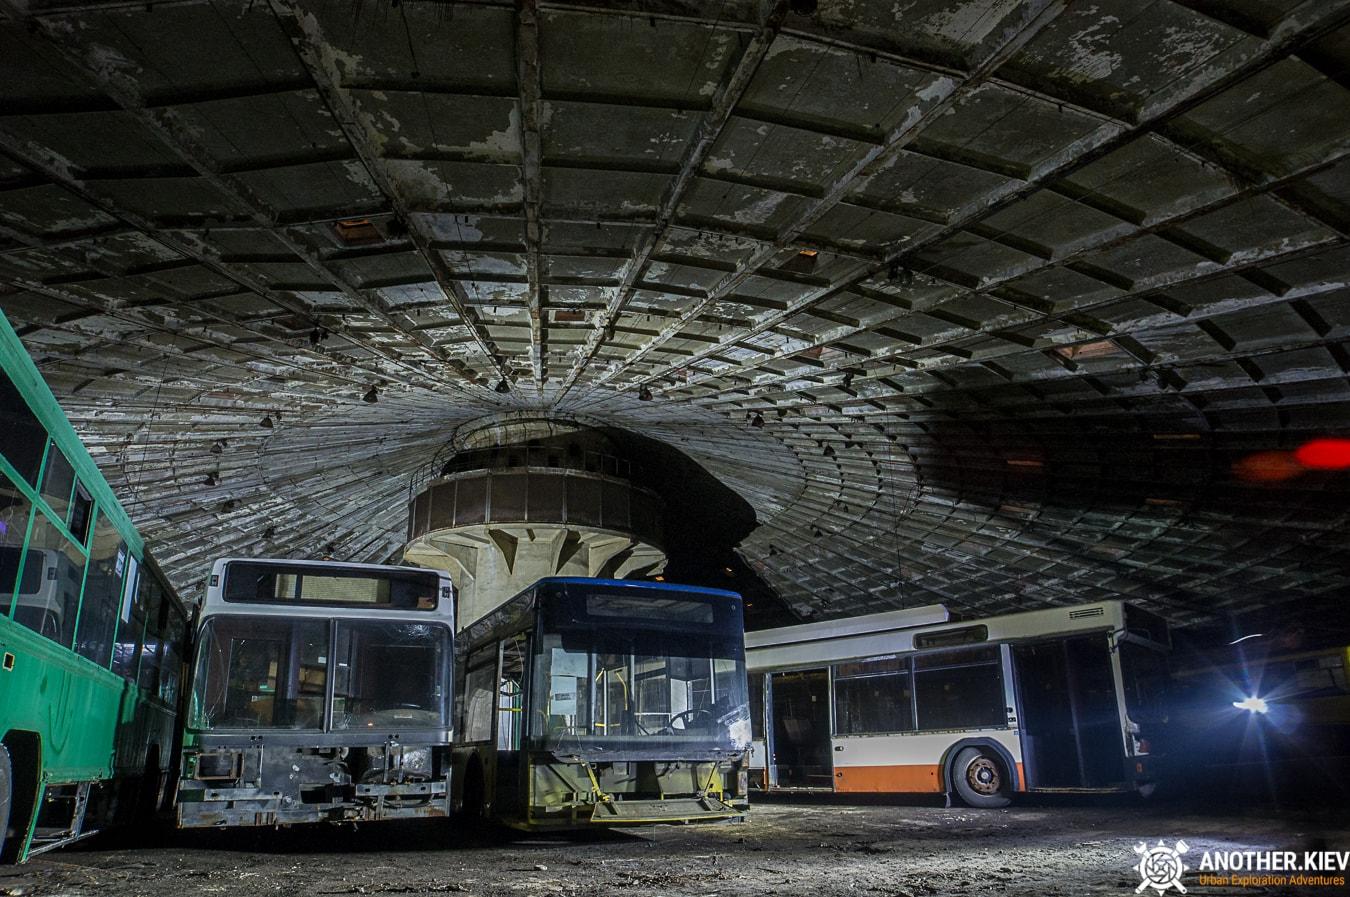 bus-graveyard-kiev-6757-min EXPLORING ABANDONED BUS GRAVEYARD IN KIEV